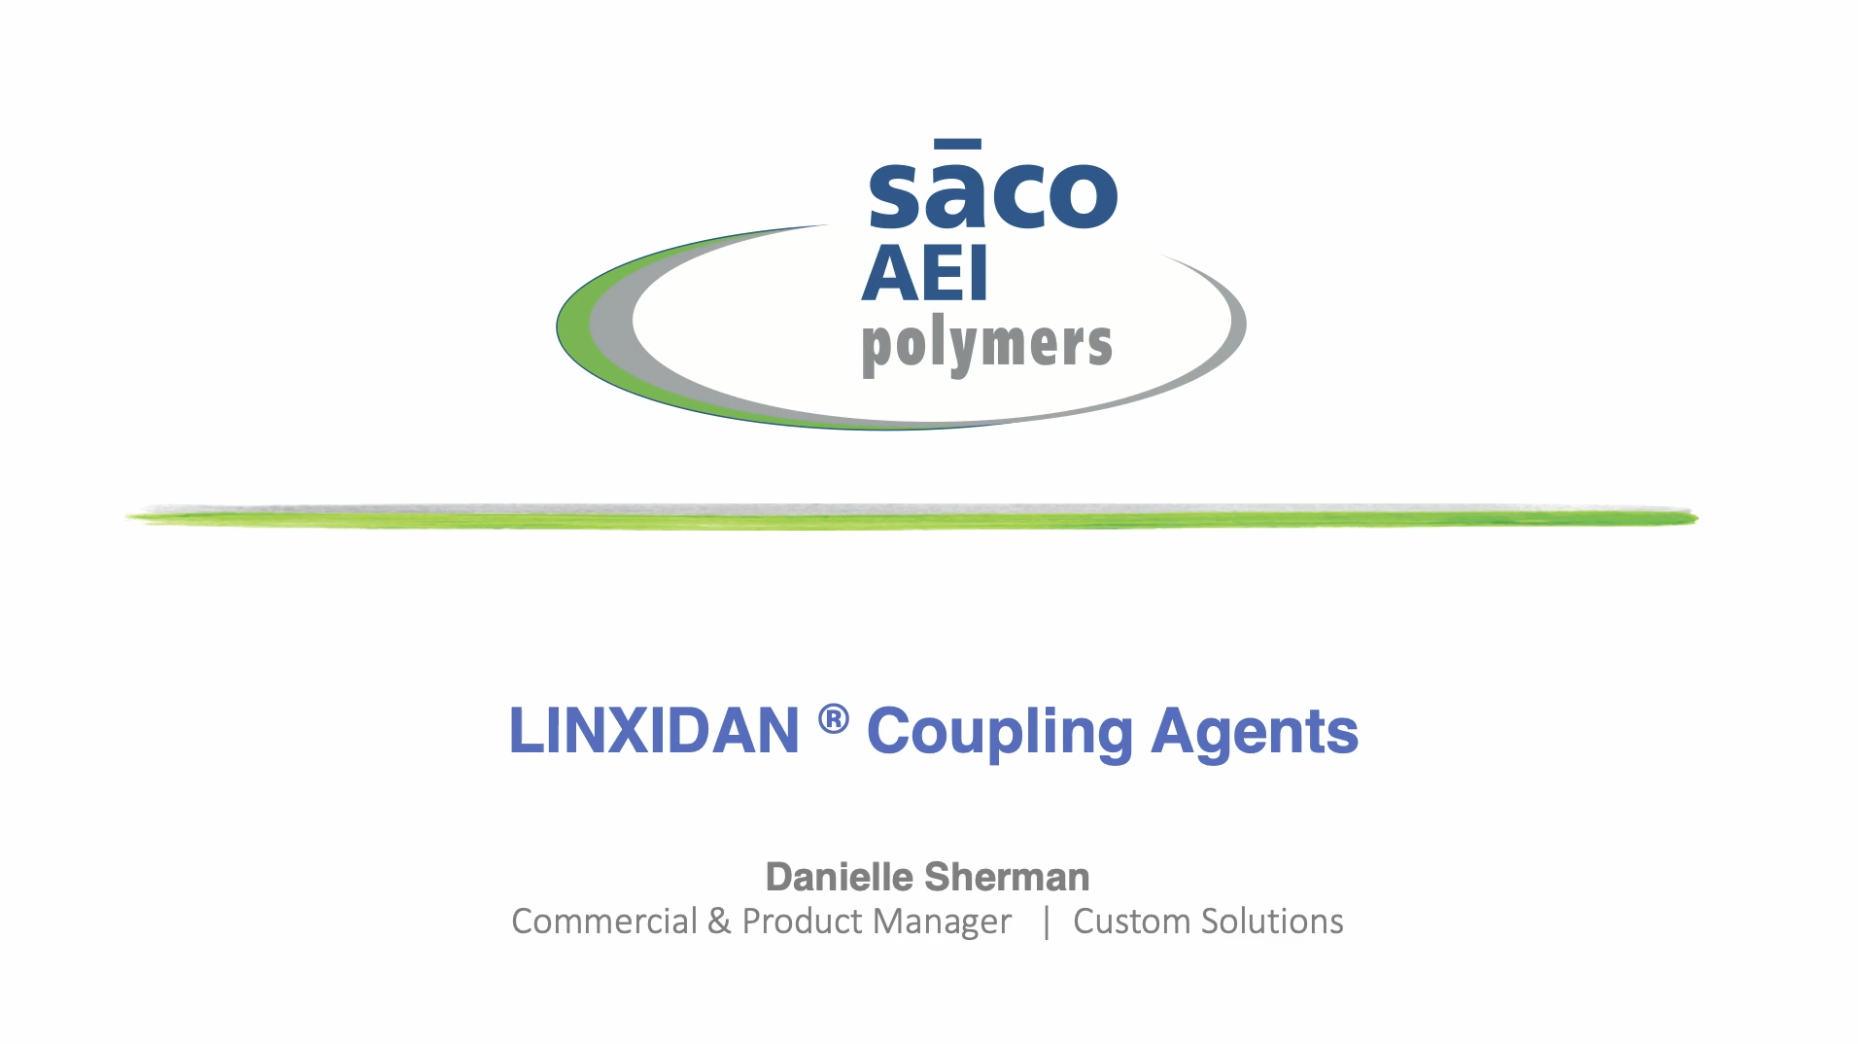 Linxidan Coupling Agents